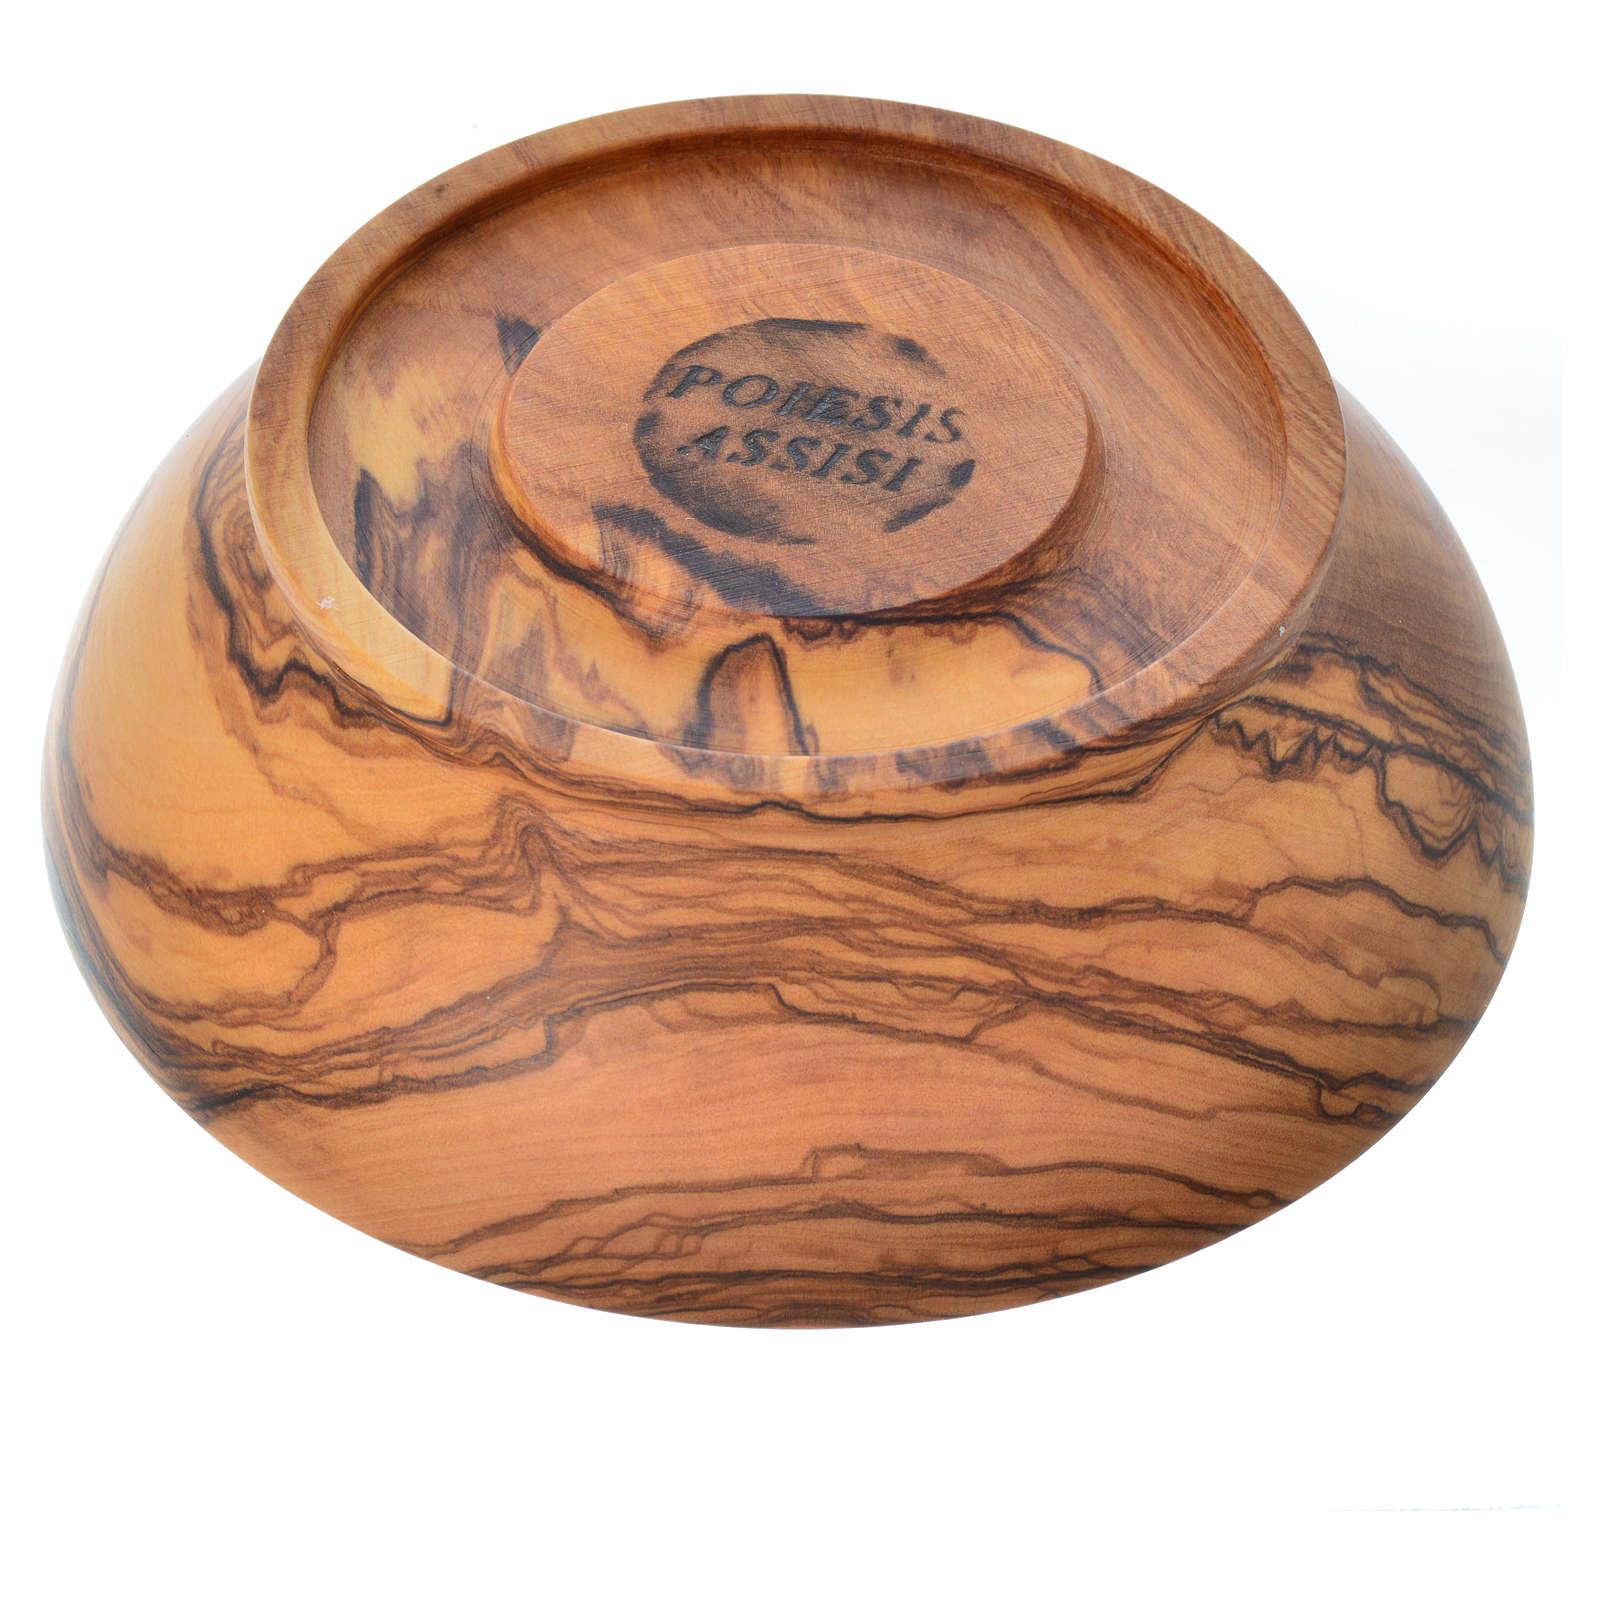 Patena ciotola olivo stagionato Assisi diam 13,5 cm 4